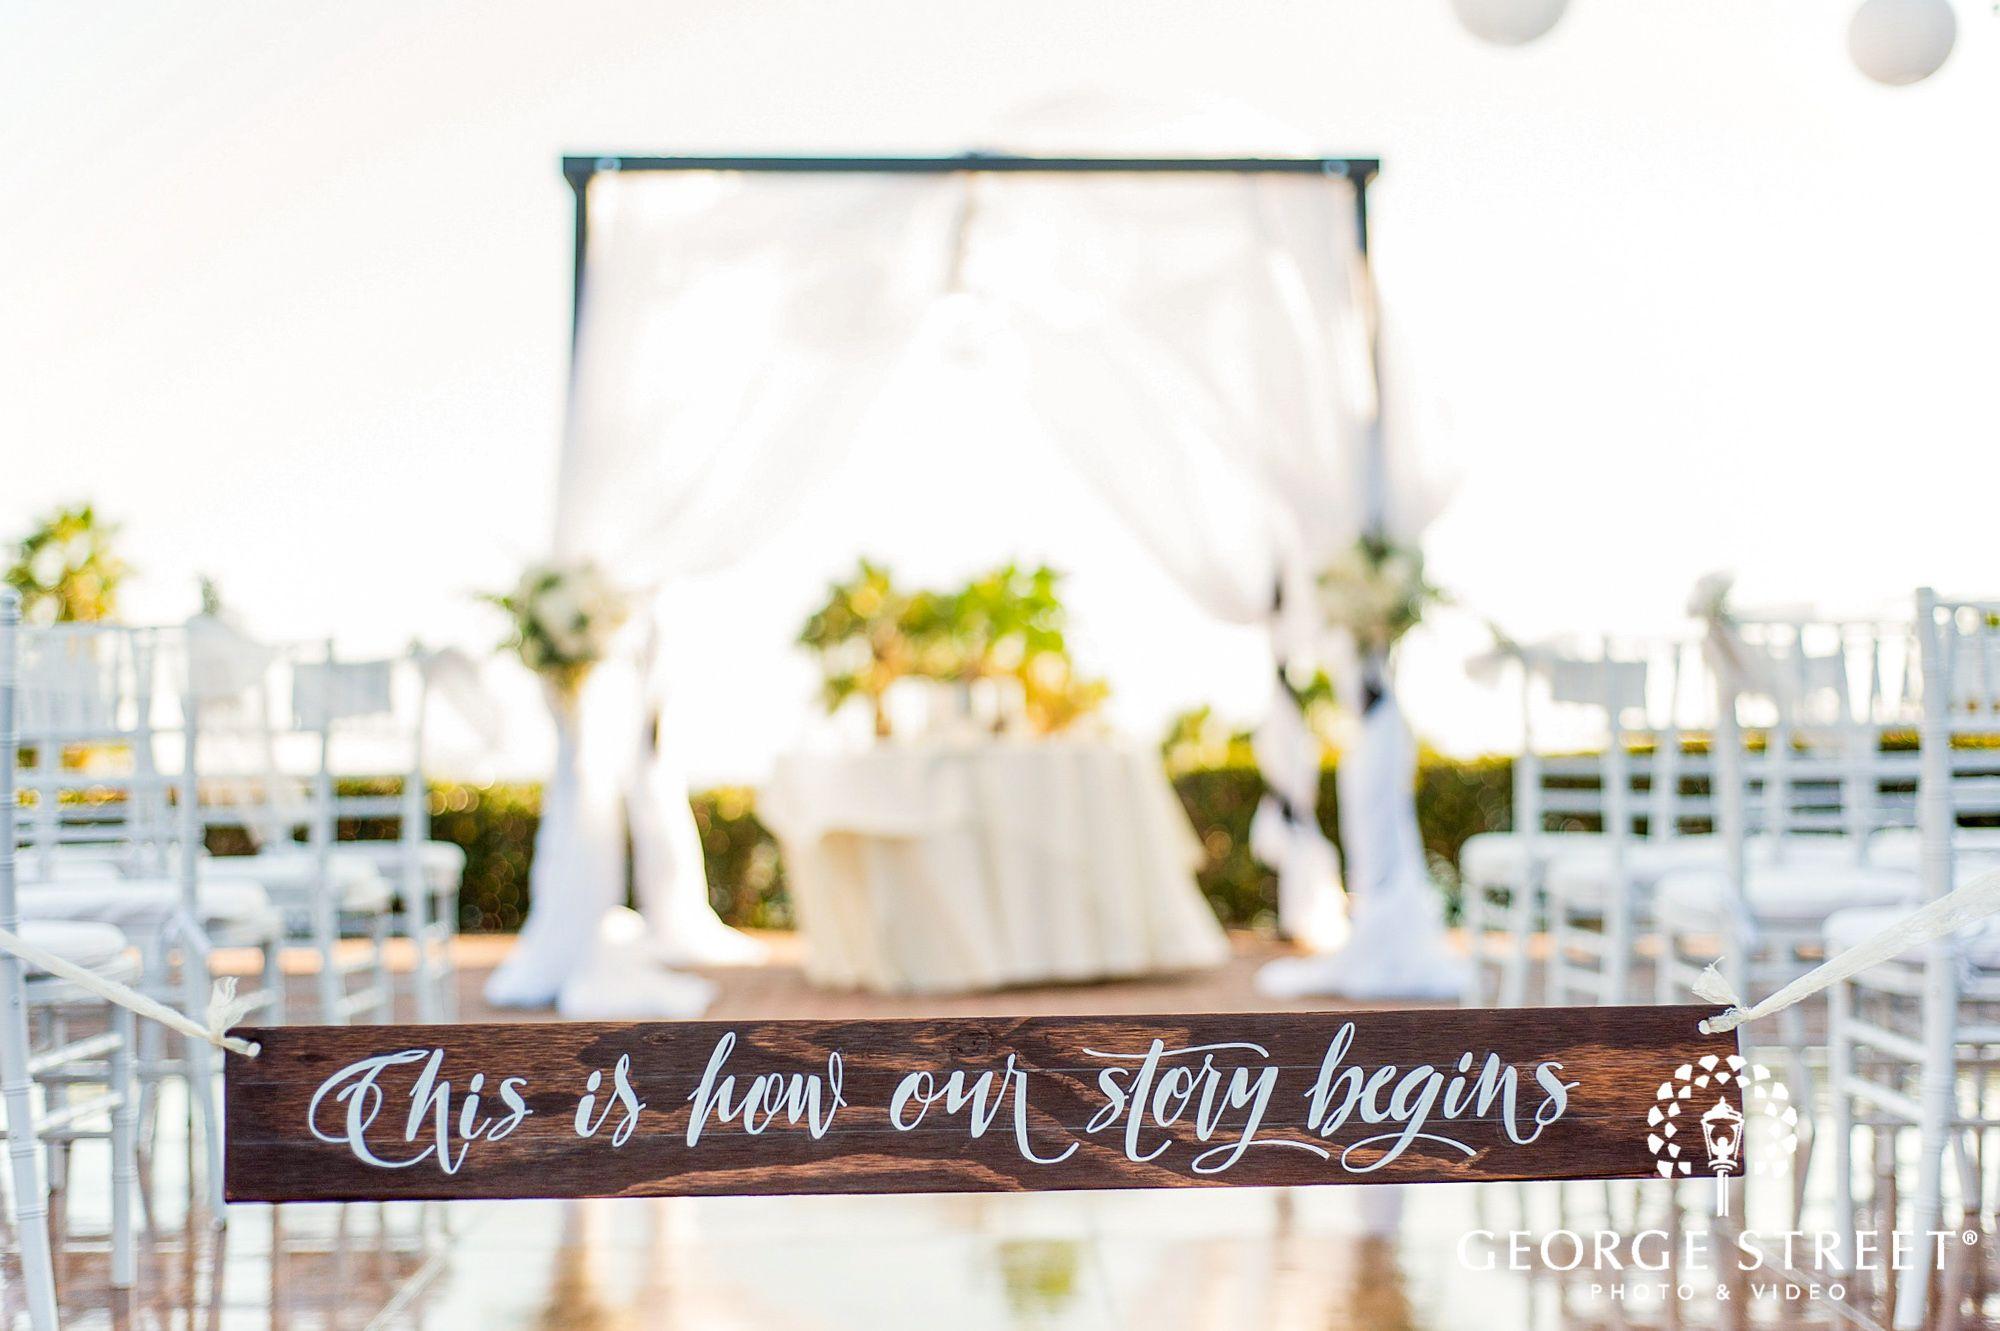 Beautiful Contemporary Wedding Theme Pictures - Wedding Idea 2018 ...